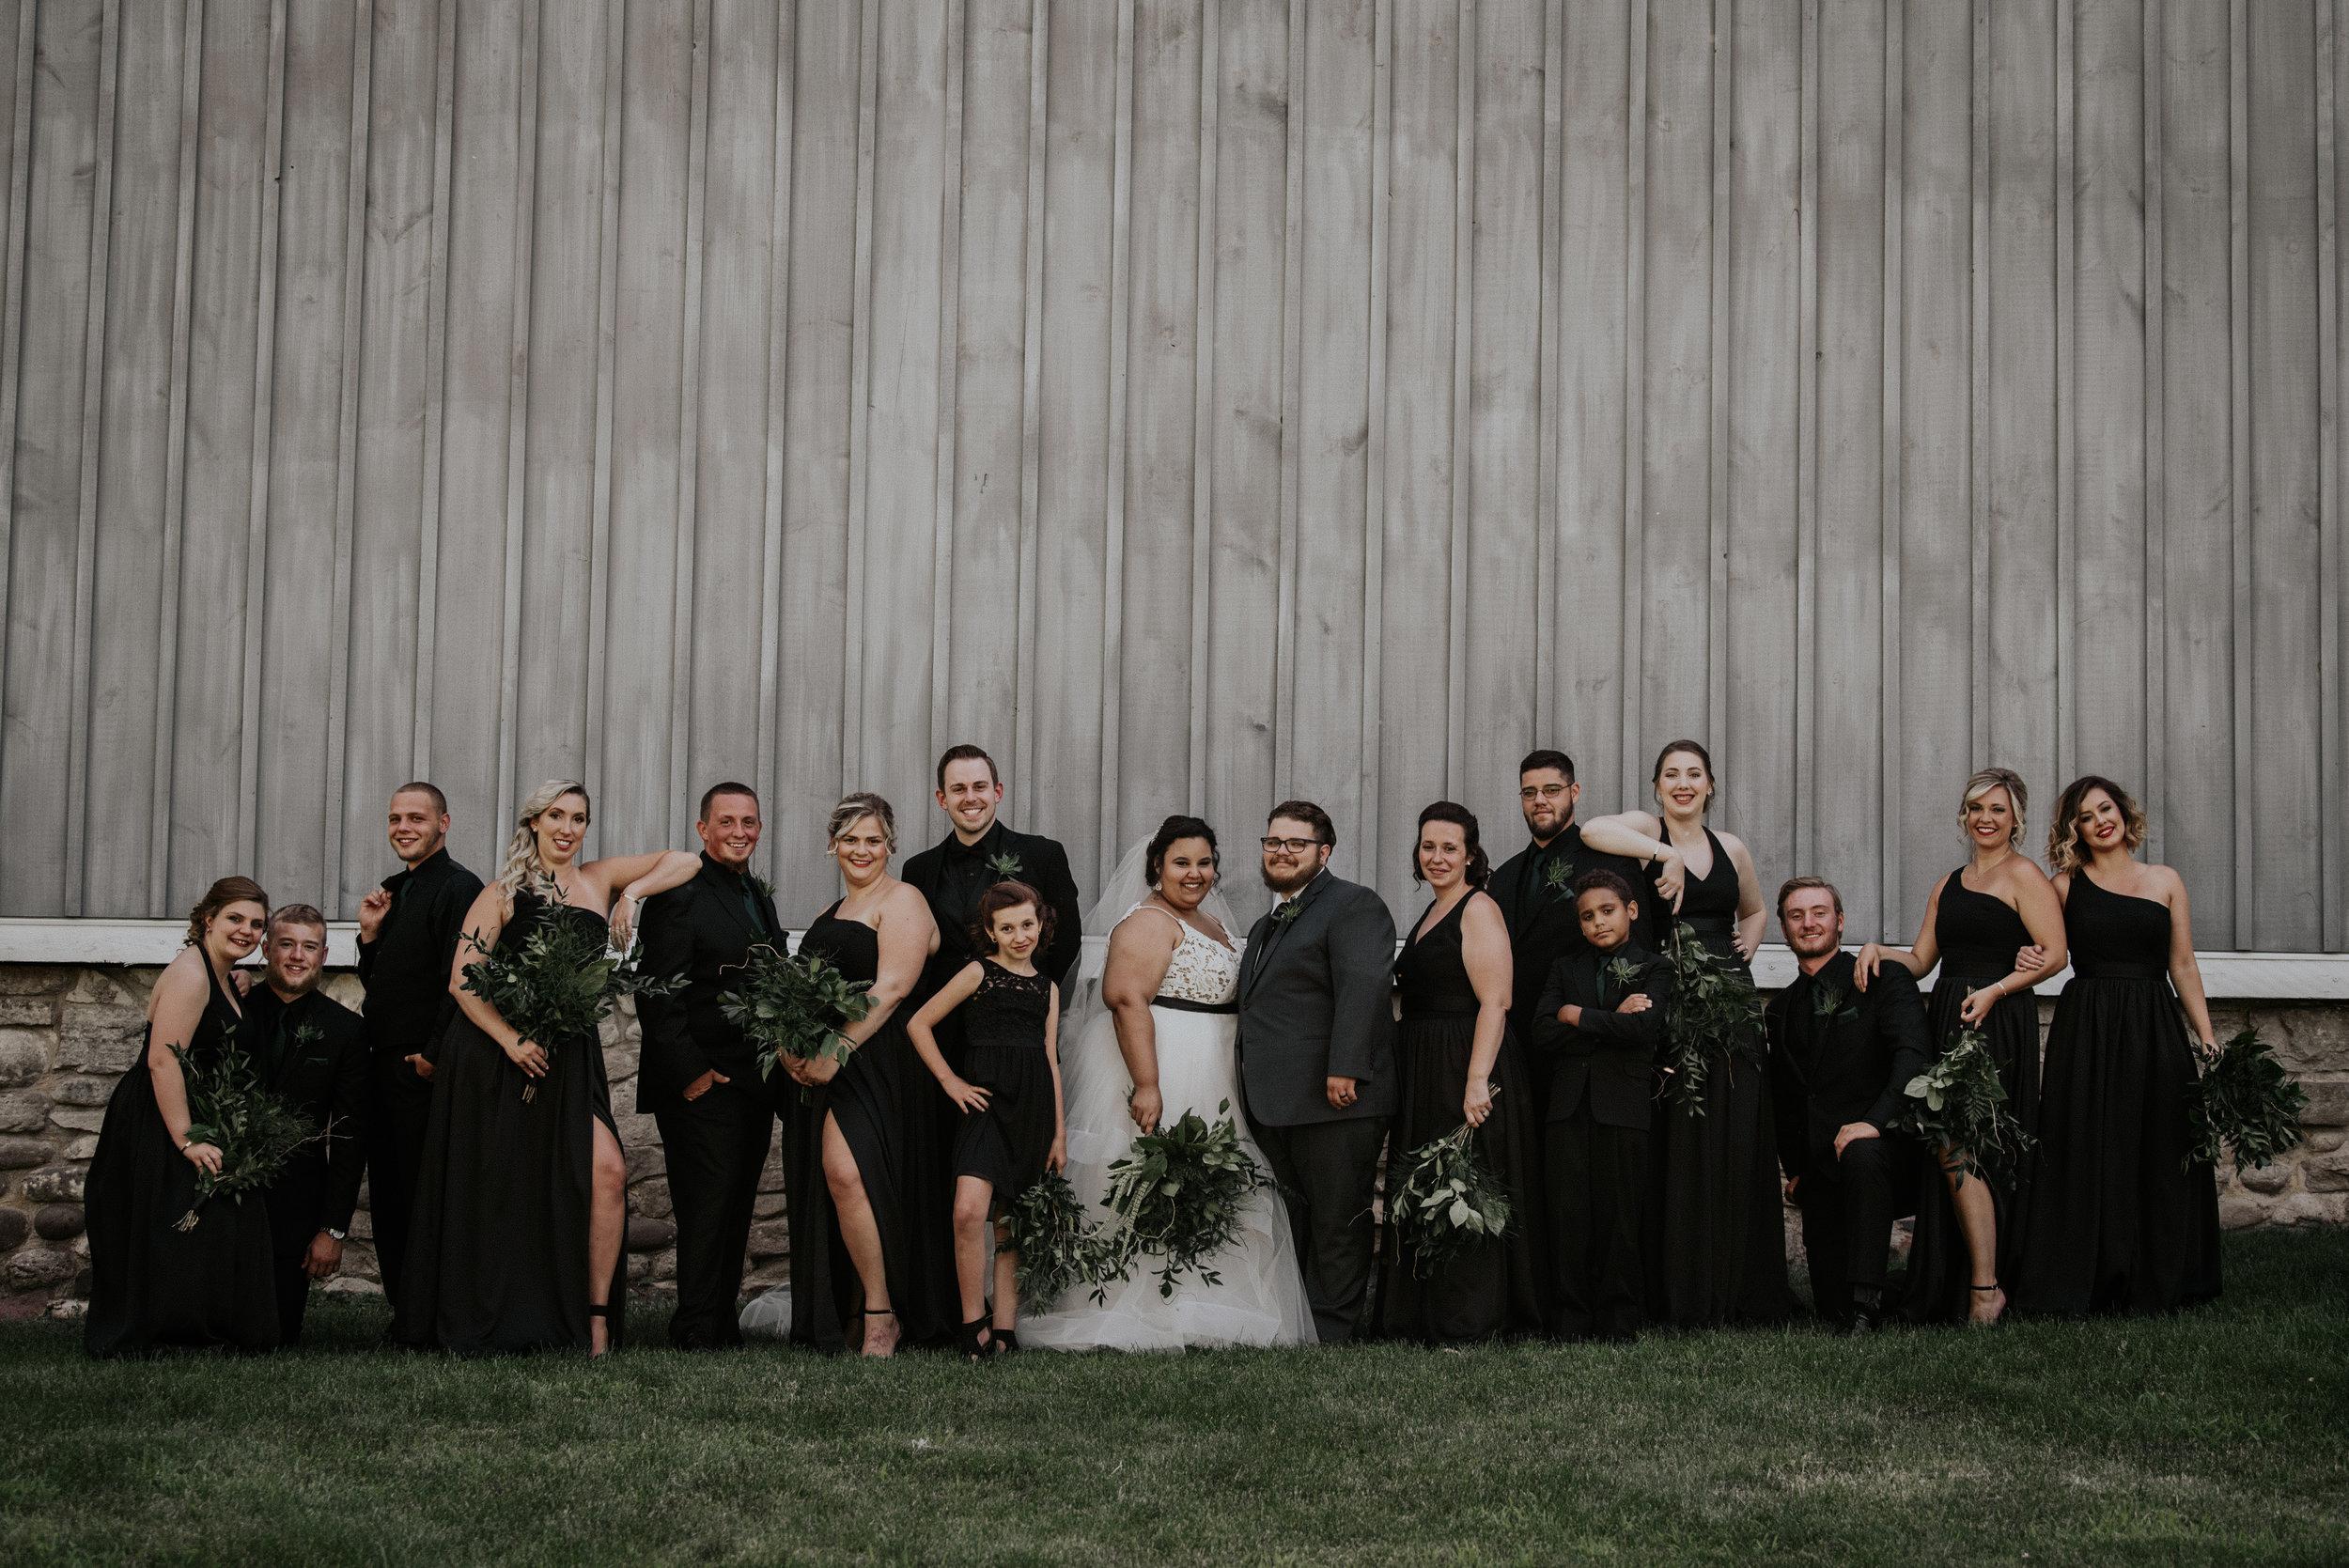 BridesbyYoung-RealWedding-PlusSizeBridal-BillyCourtney-JurassicParkTheme-33.jpg